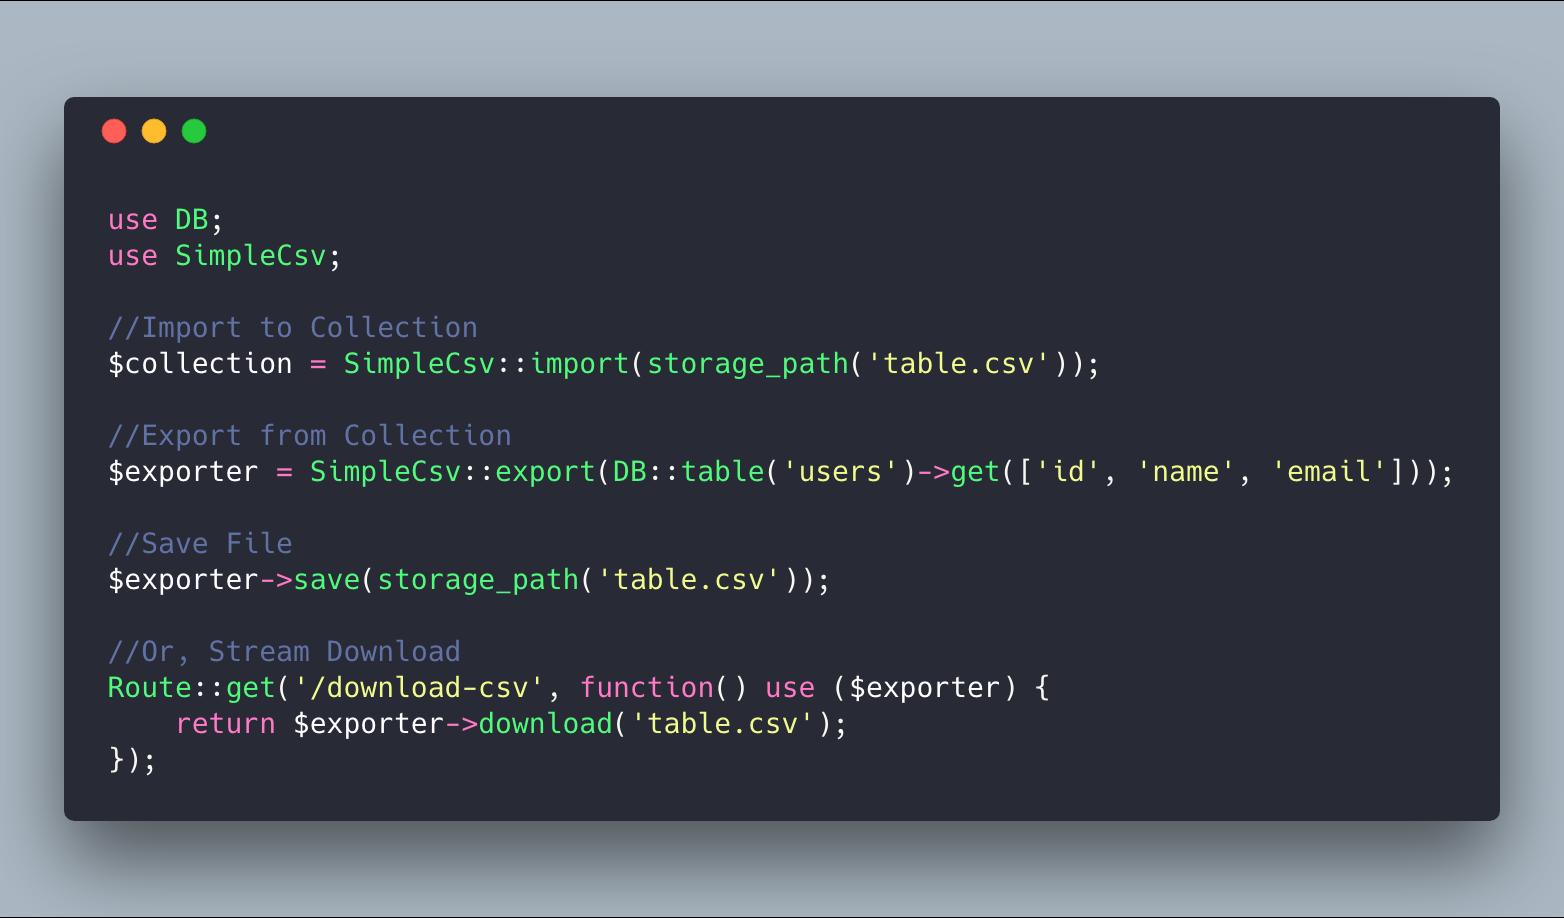 GitHub - bayareawebpro/laravel-simple-csv: A simple CSV importer